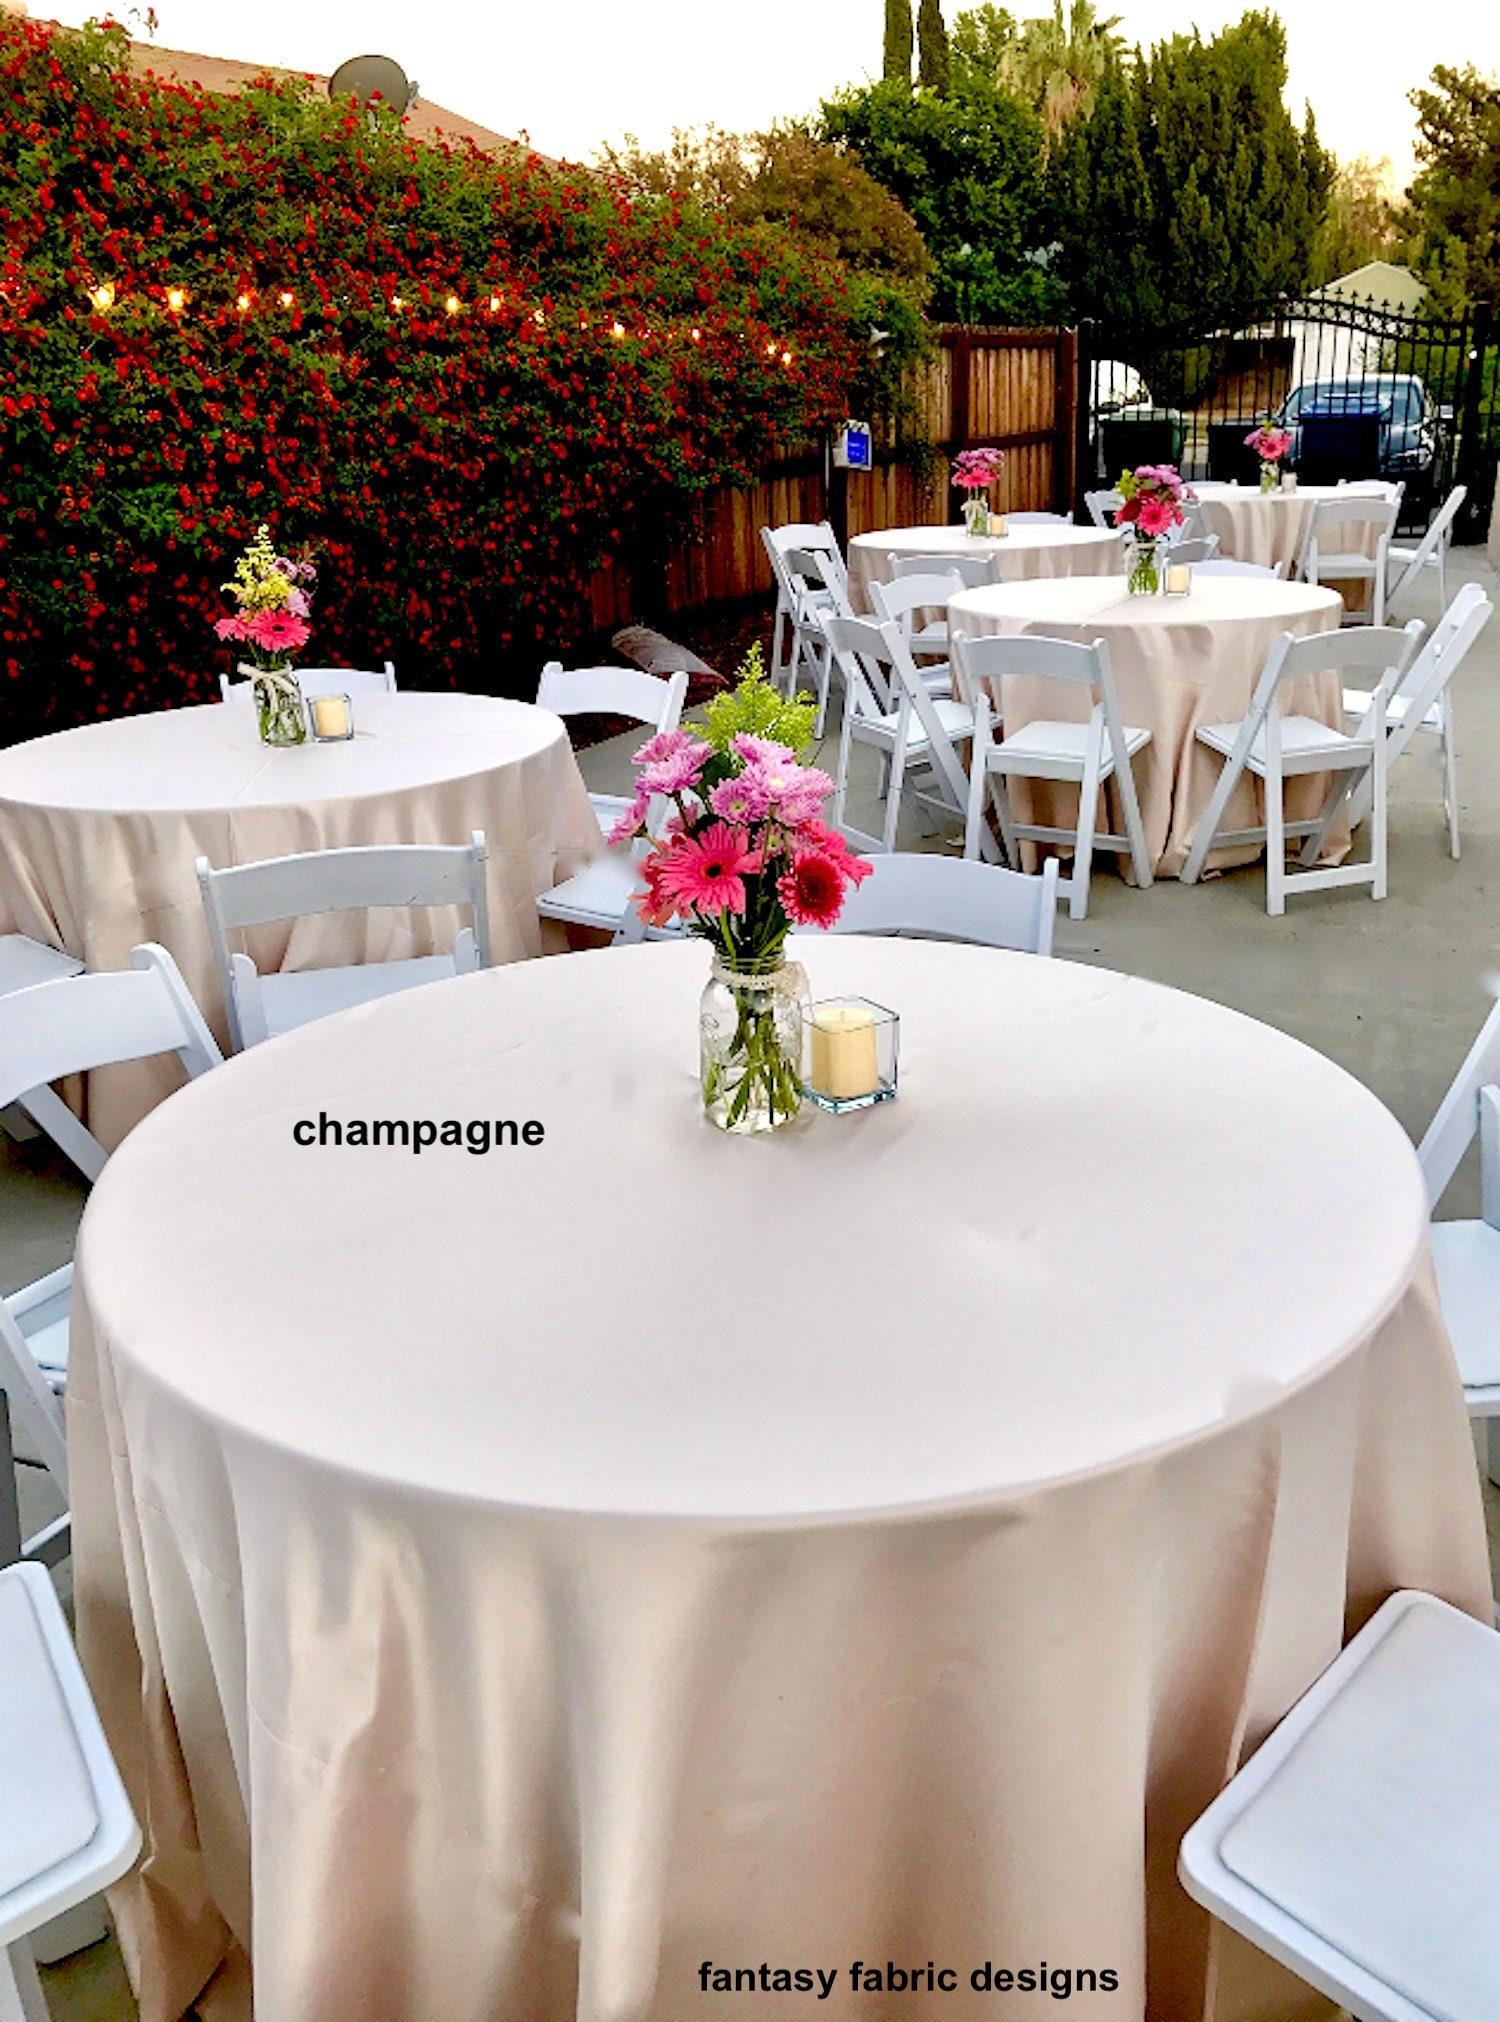 Tablecloth Wedding Tablecloth Lamour Satin Tablecloth Table Overlay Table Runner Bridal Baby Shower Table Cloth Satin Sale